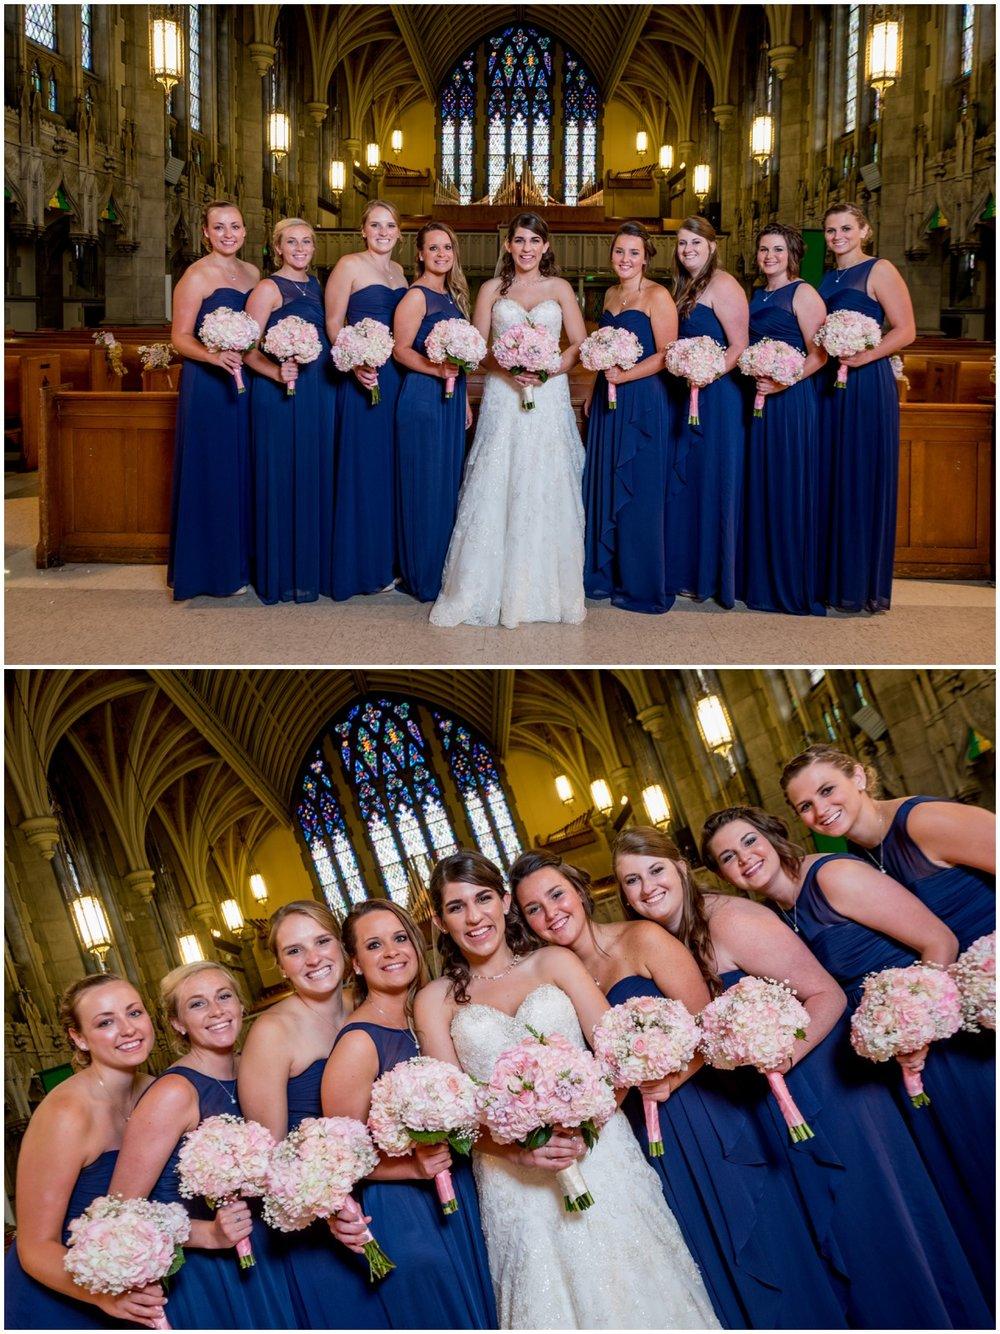 North-United-Methodist-Church-wedding-pictures_0011.jpg